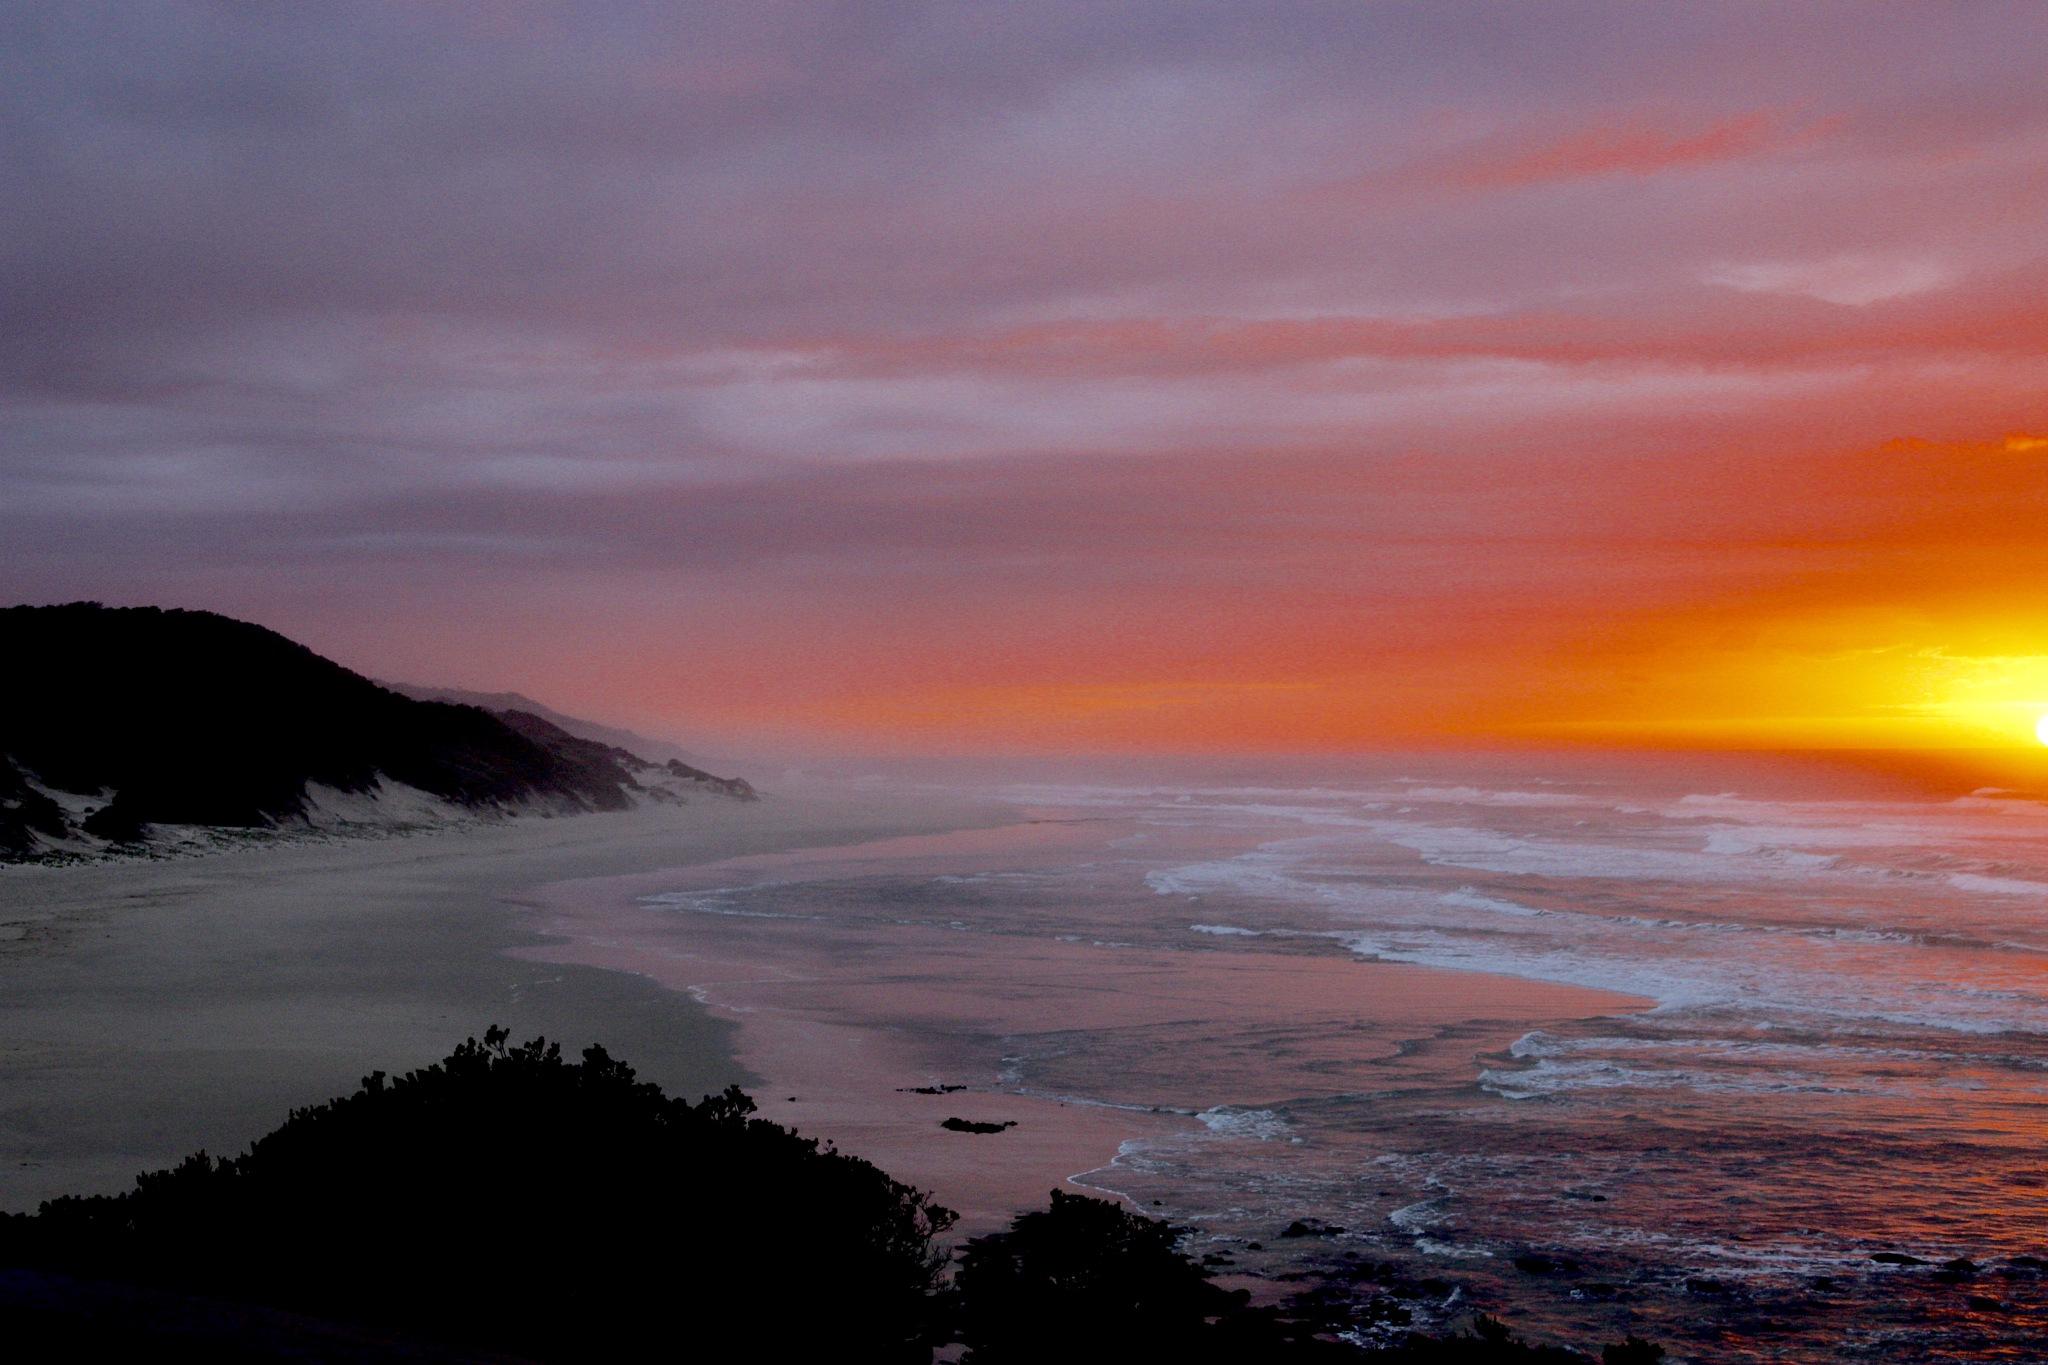 Sunrise by sandybrady